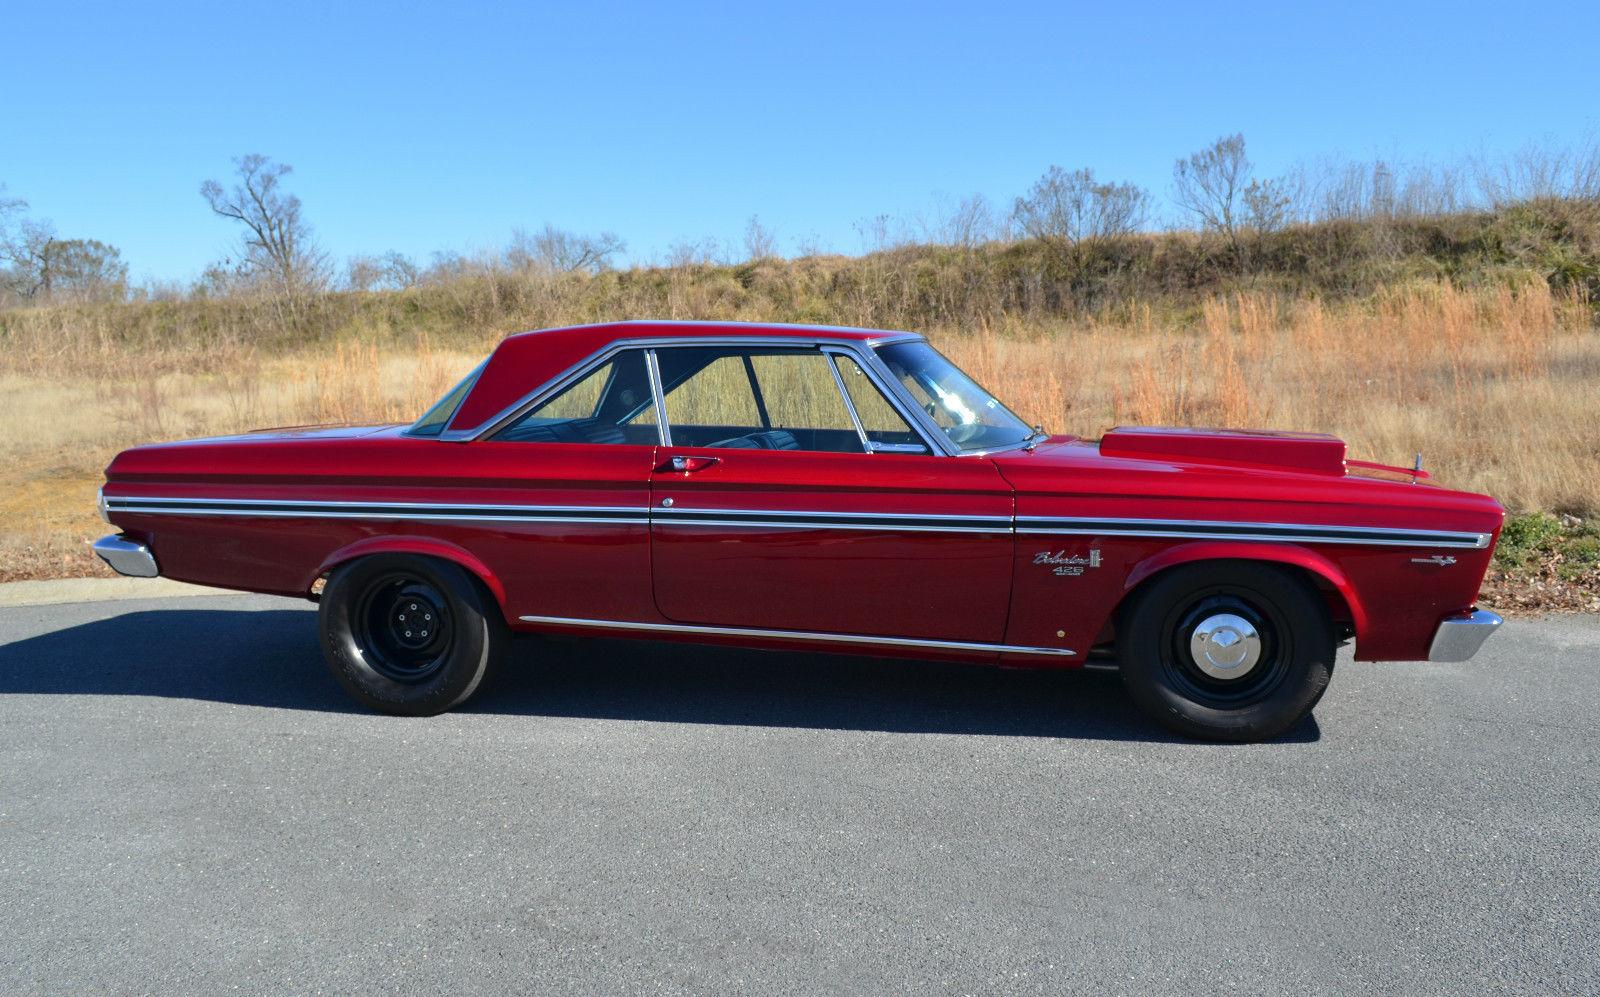 1965 Plymouth Belvedere  426 Hemi